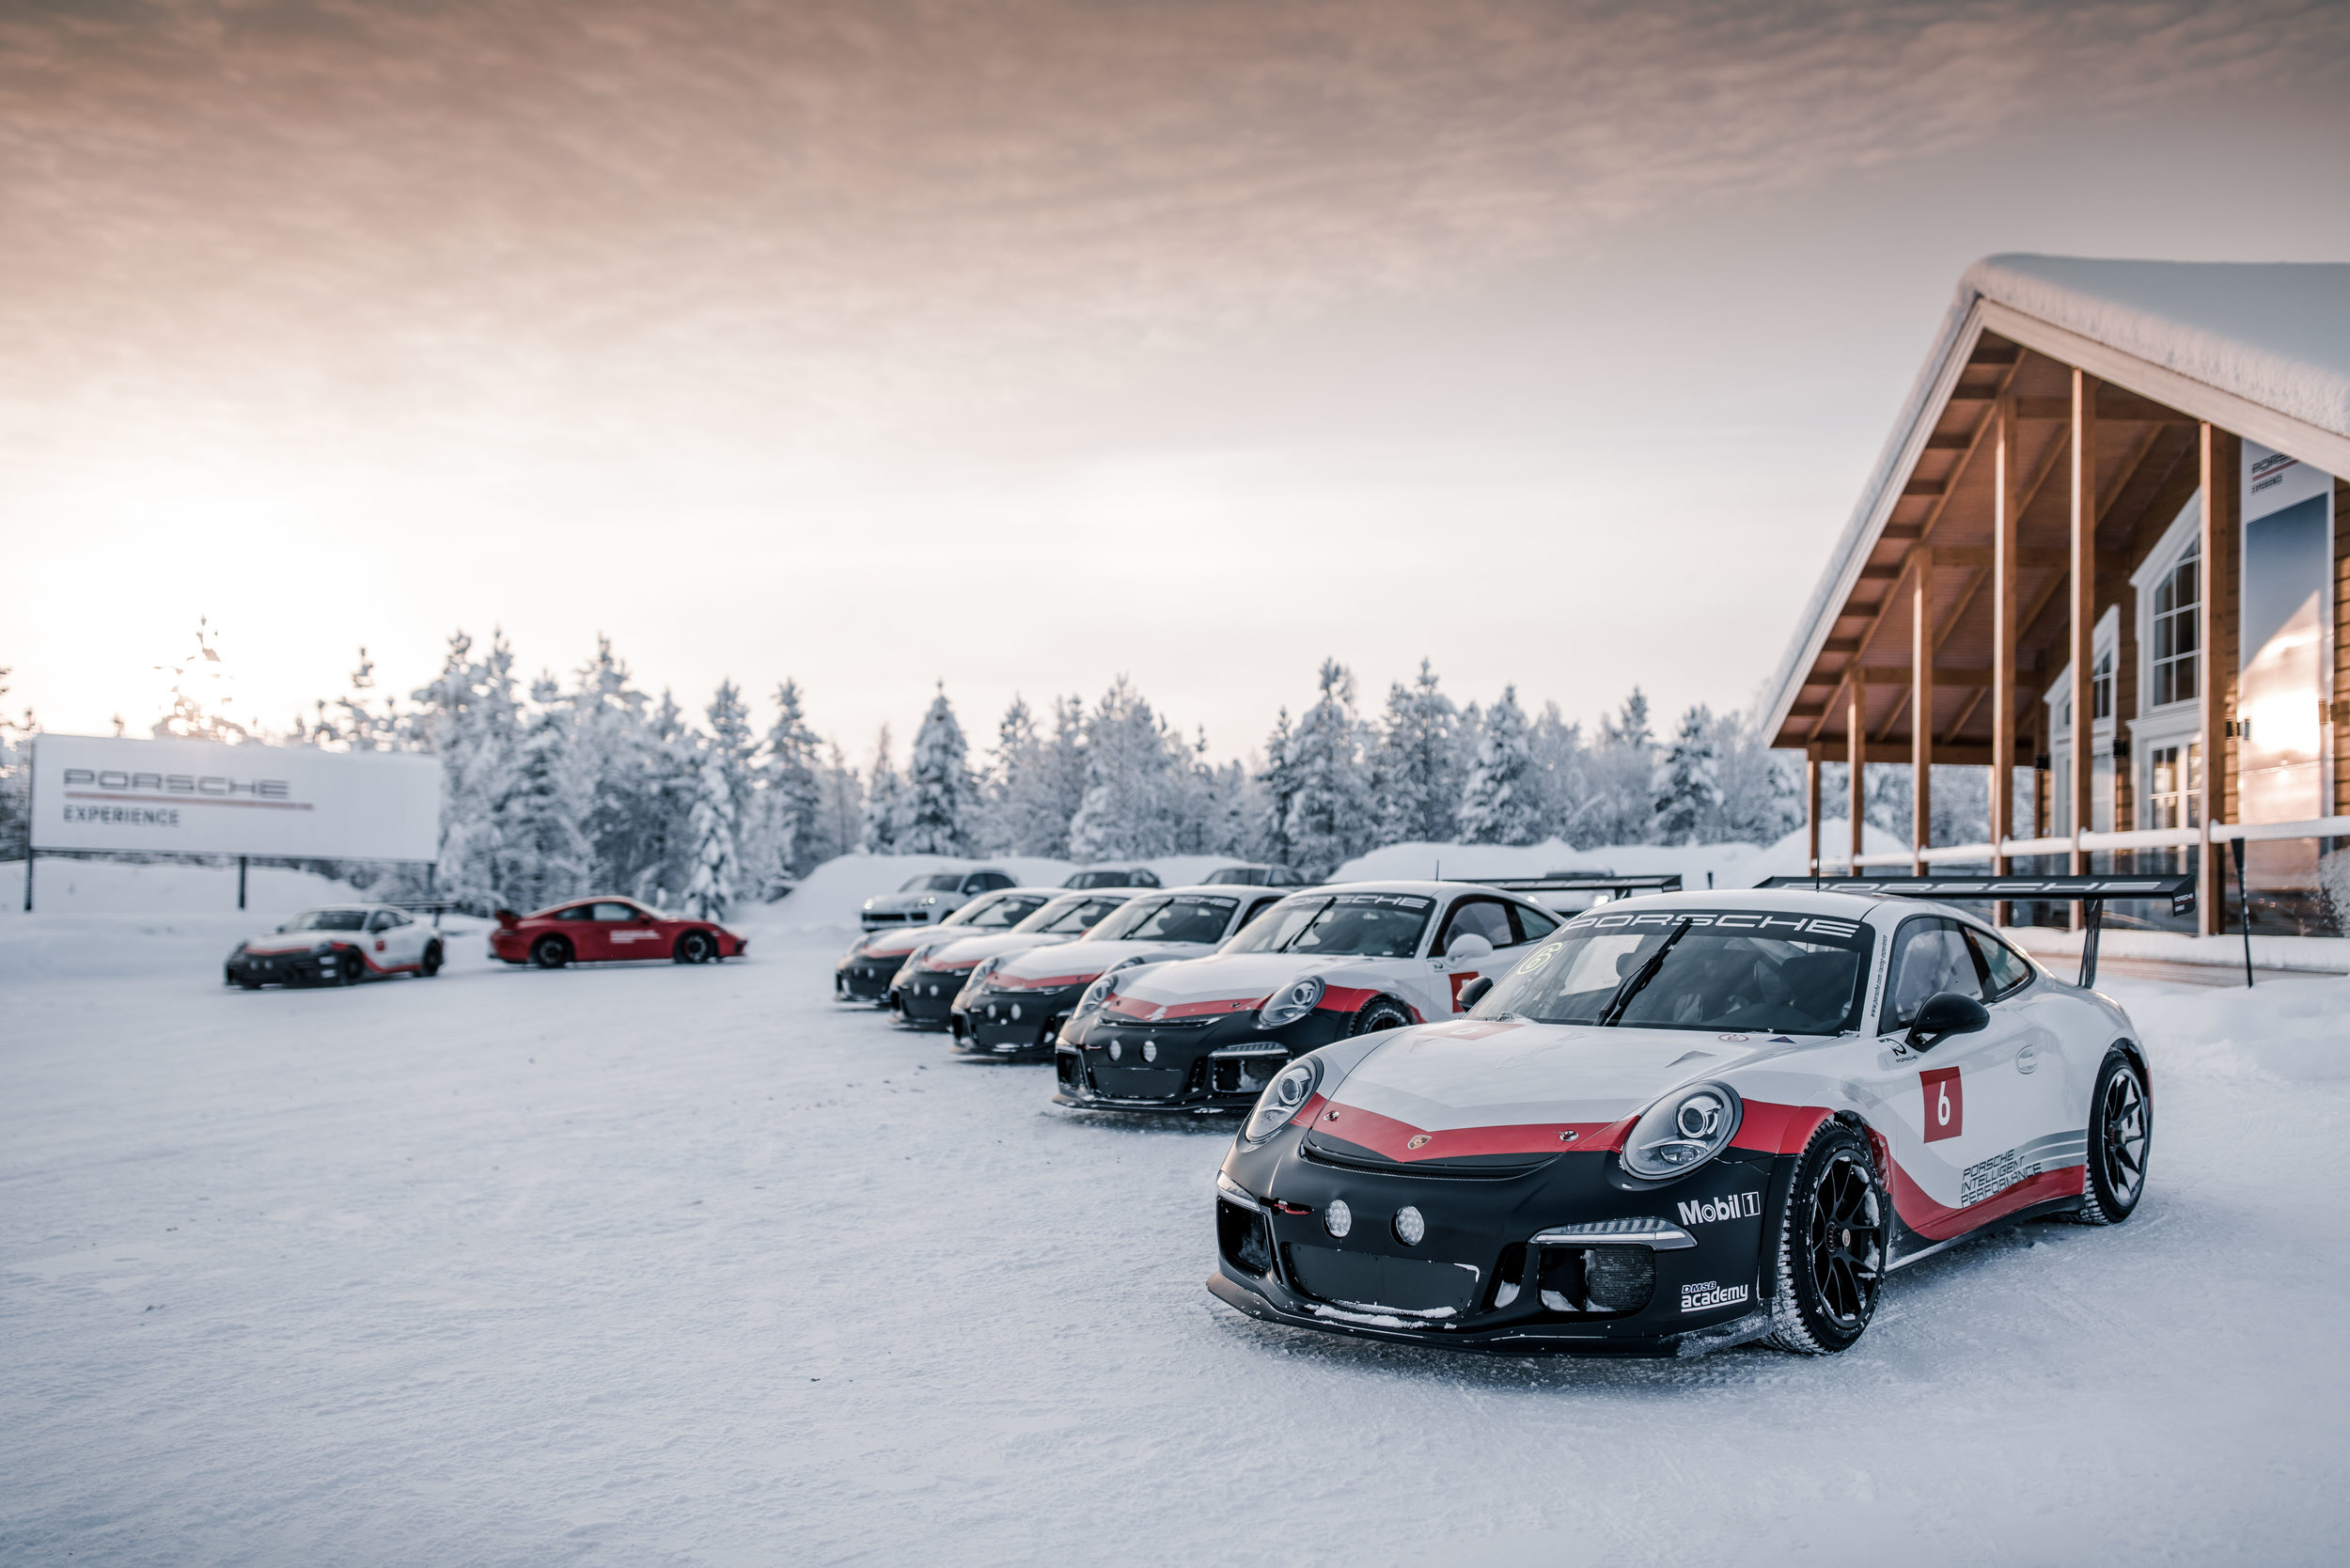 Porsche Ice Experience on Ice_30_01_2019_1589_175846.jpg